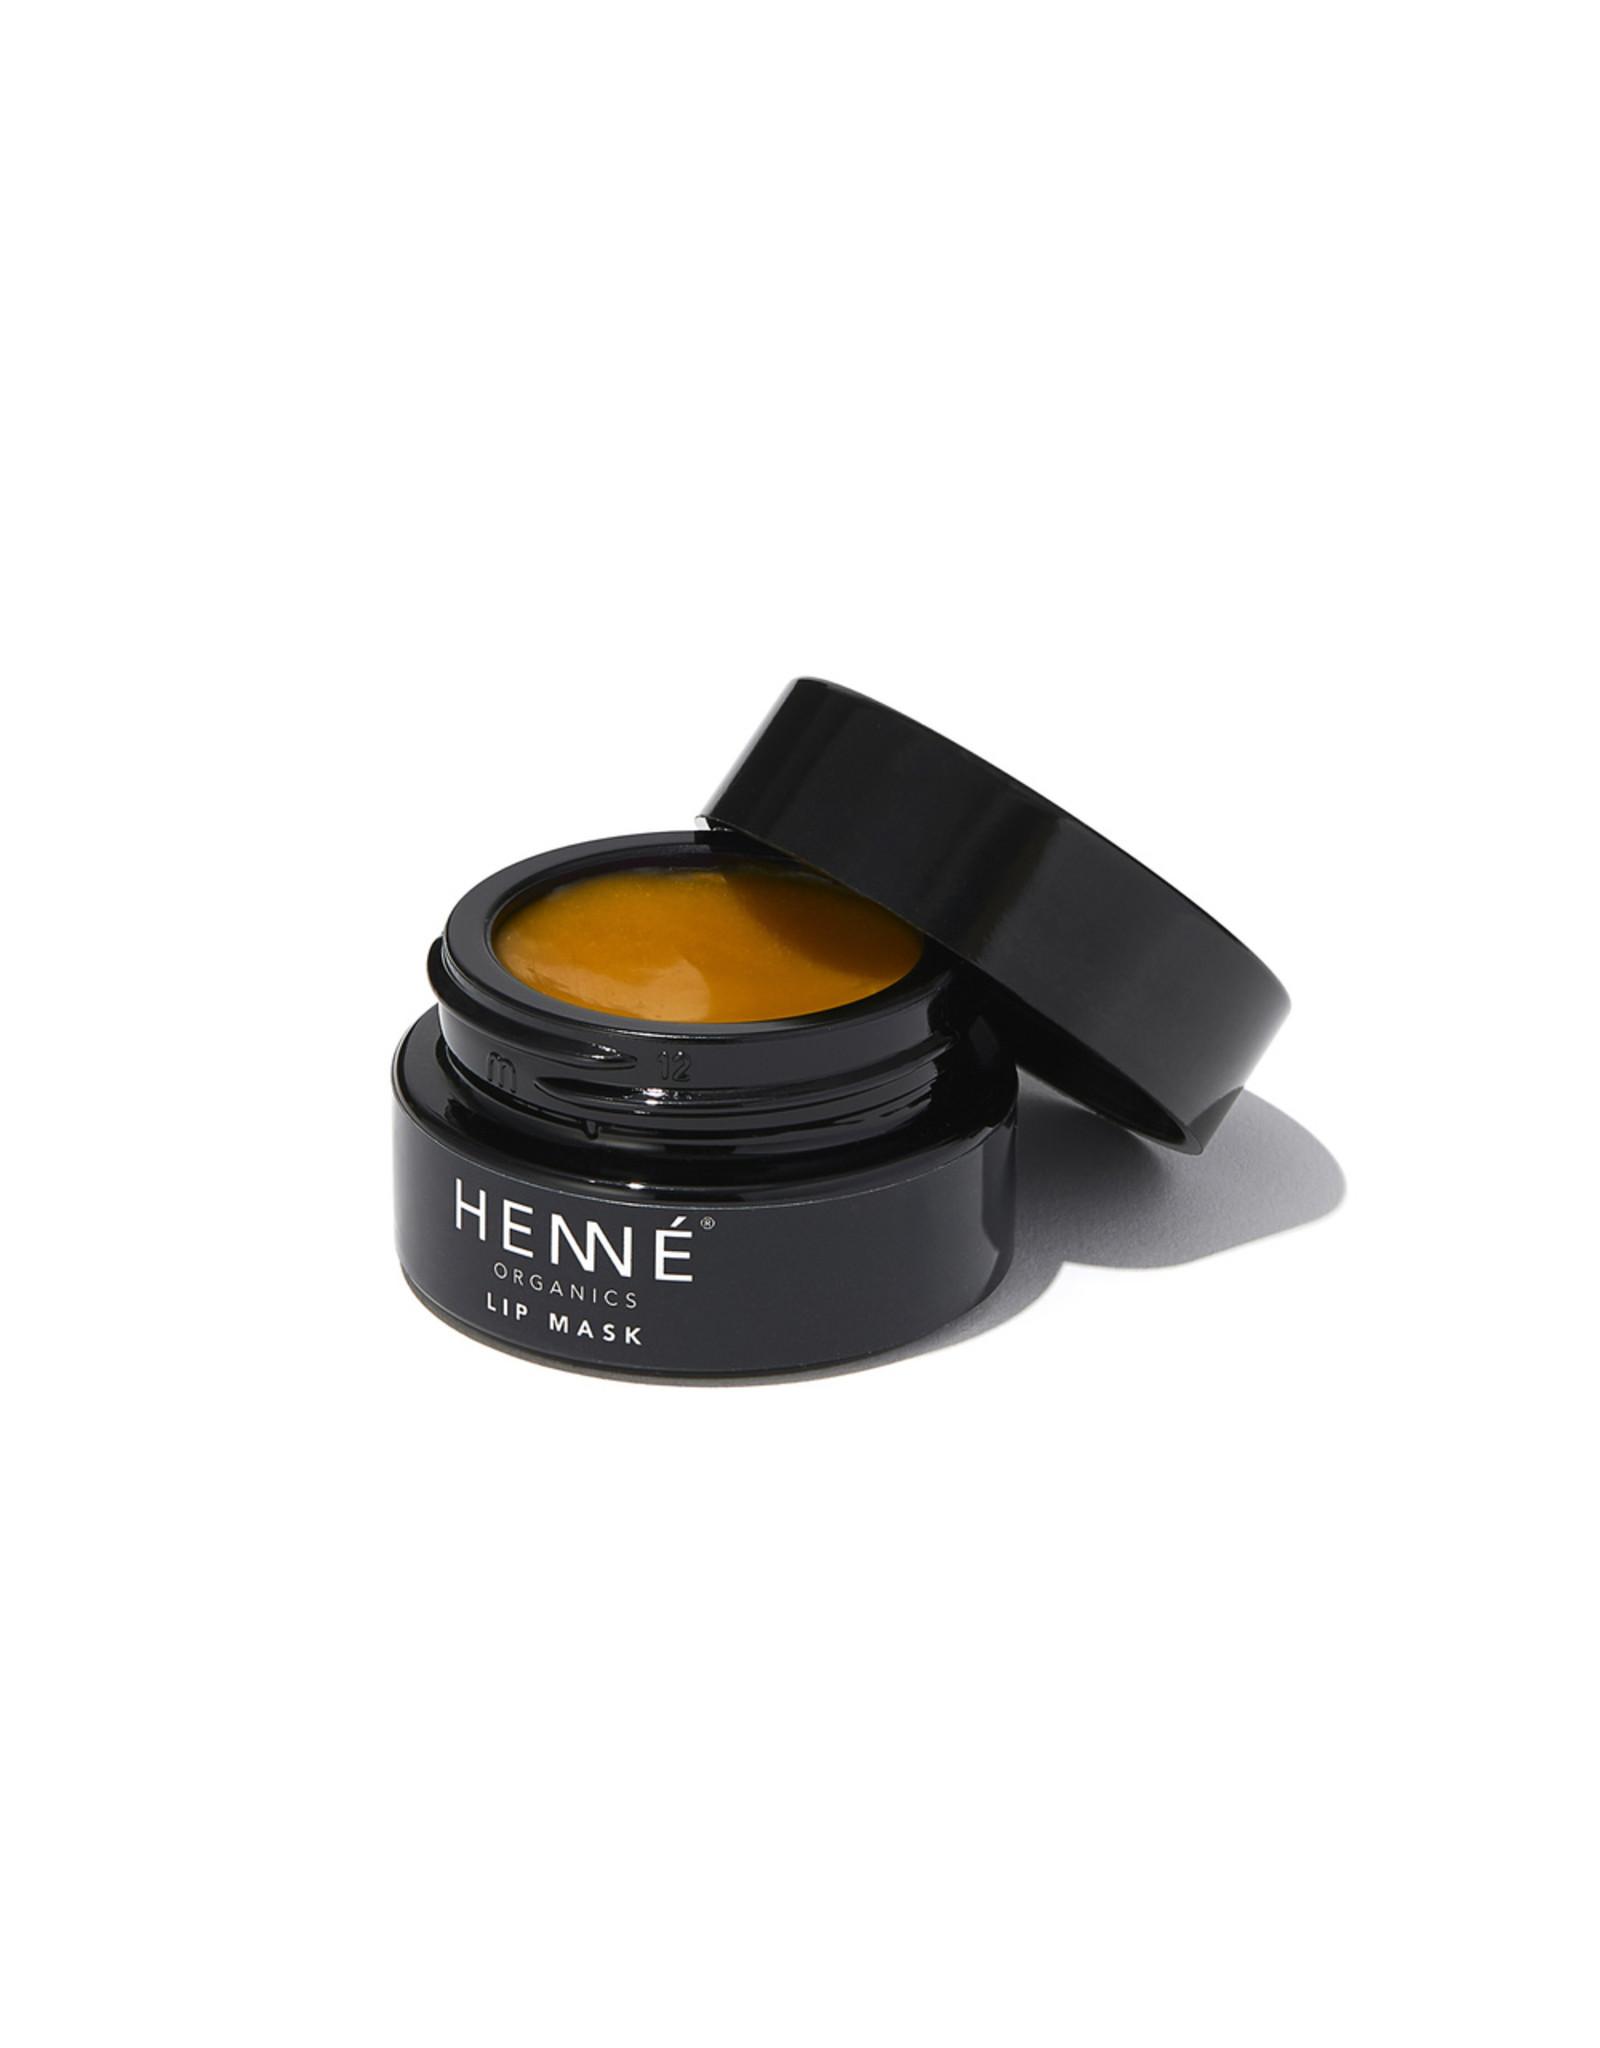 Henne Organics Henne Organics Lip Mask